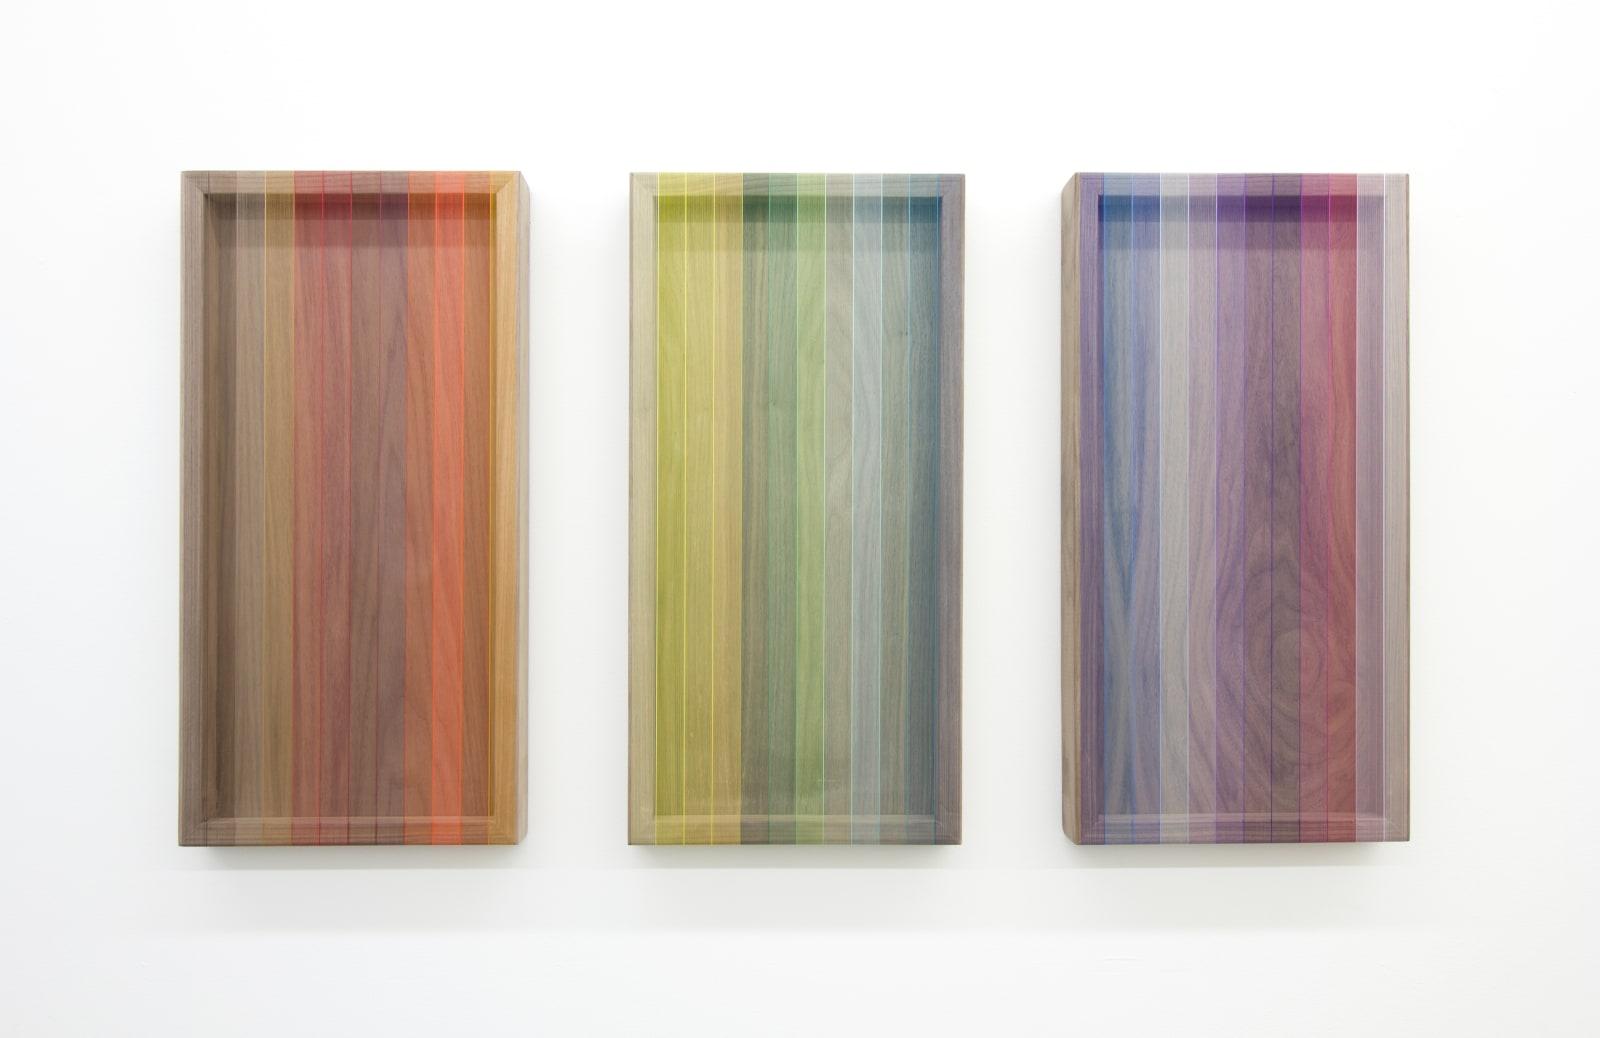 Brian Wills, Untitled (Spectrum), 2019